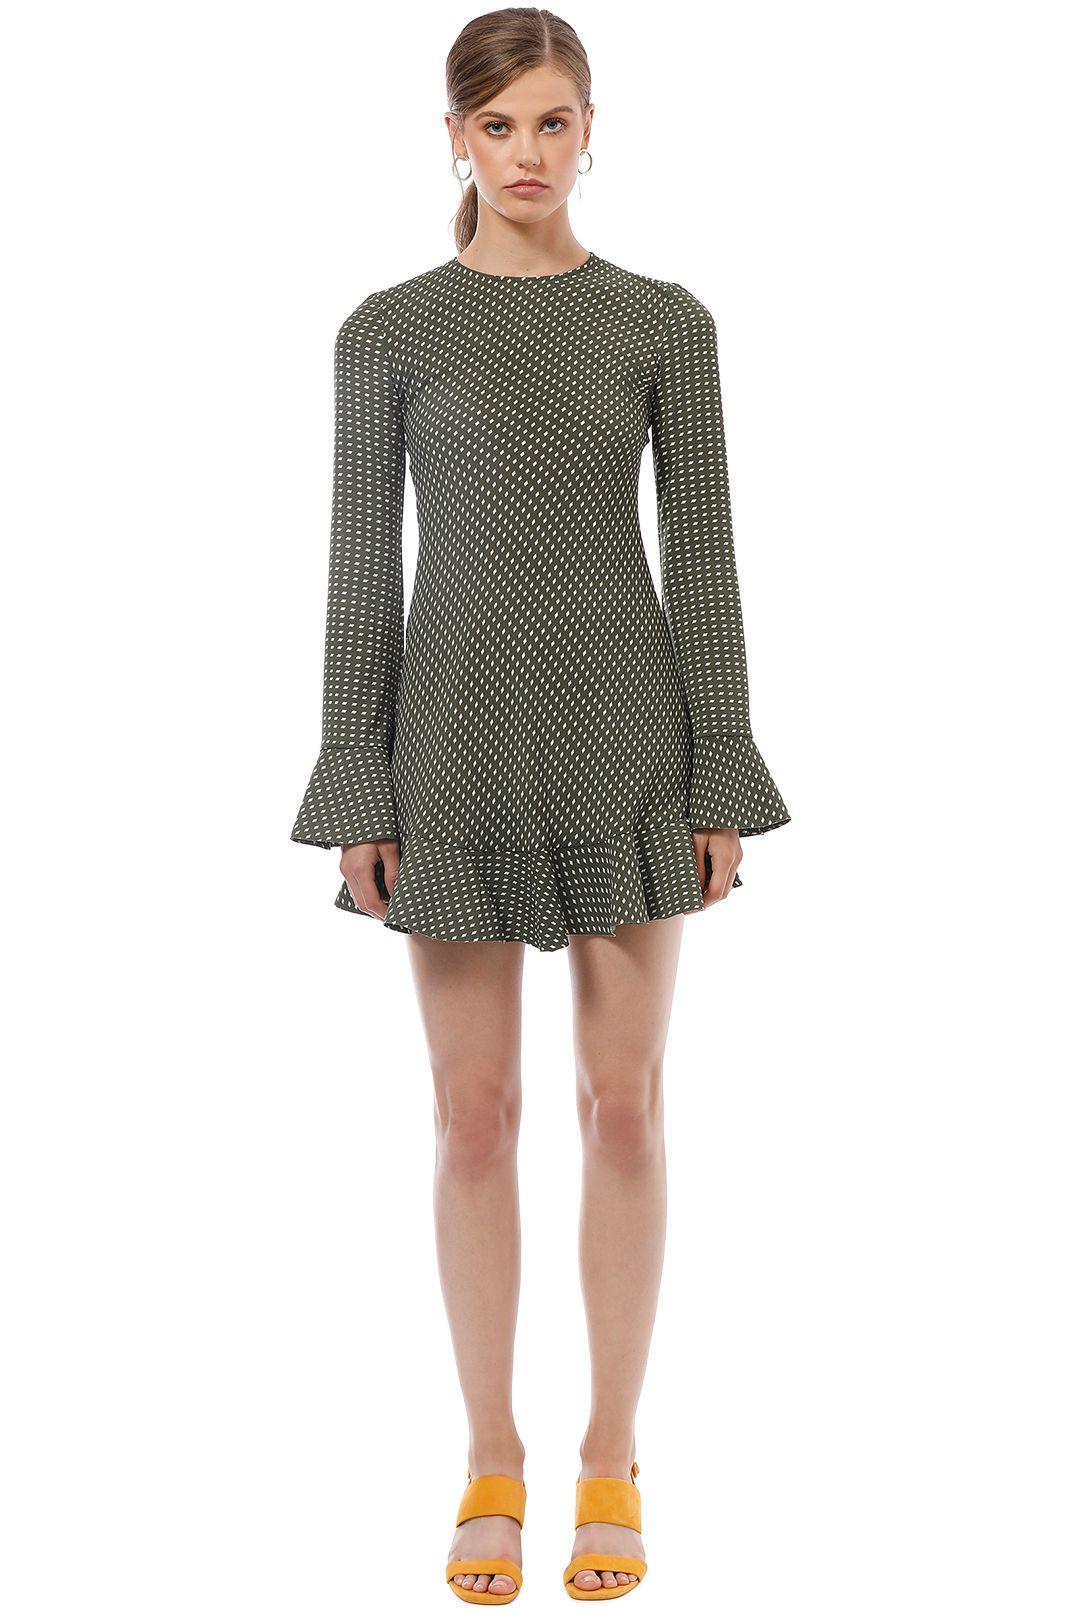 By Johnny - Issy Flute Mini Dress - Green Polka - Front